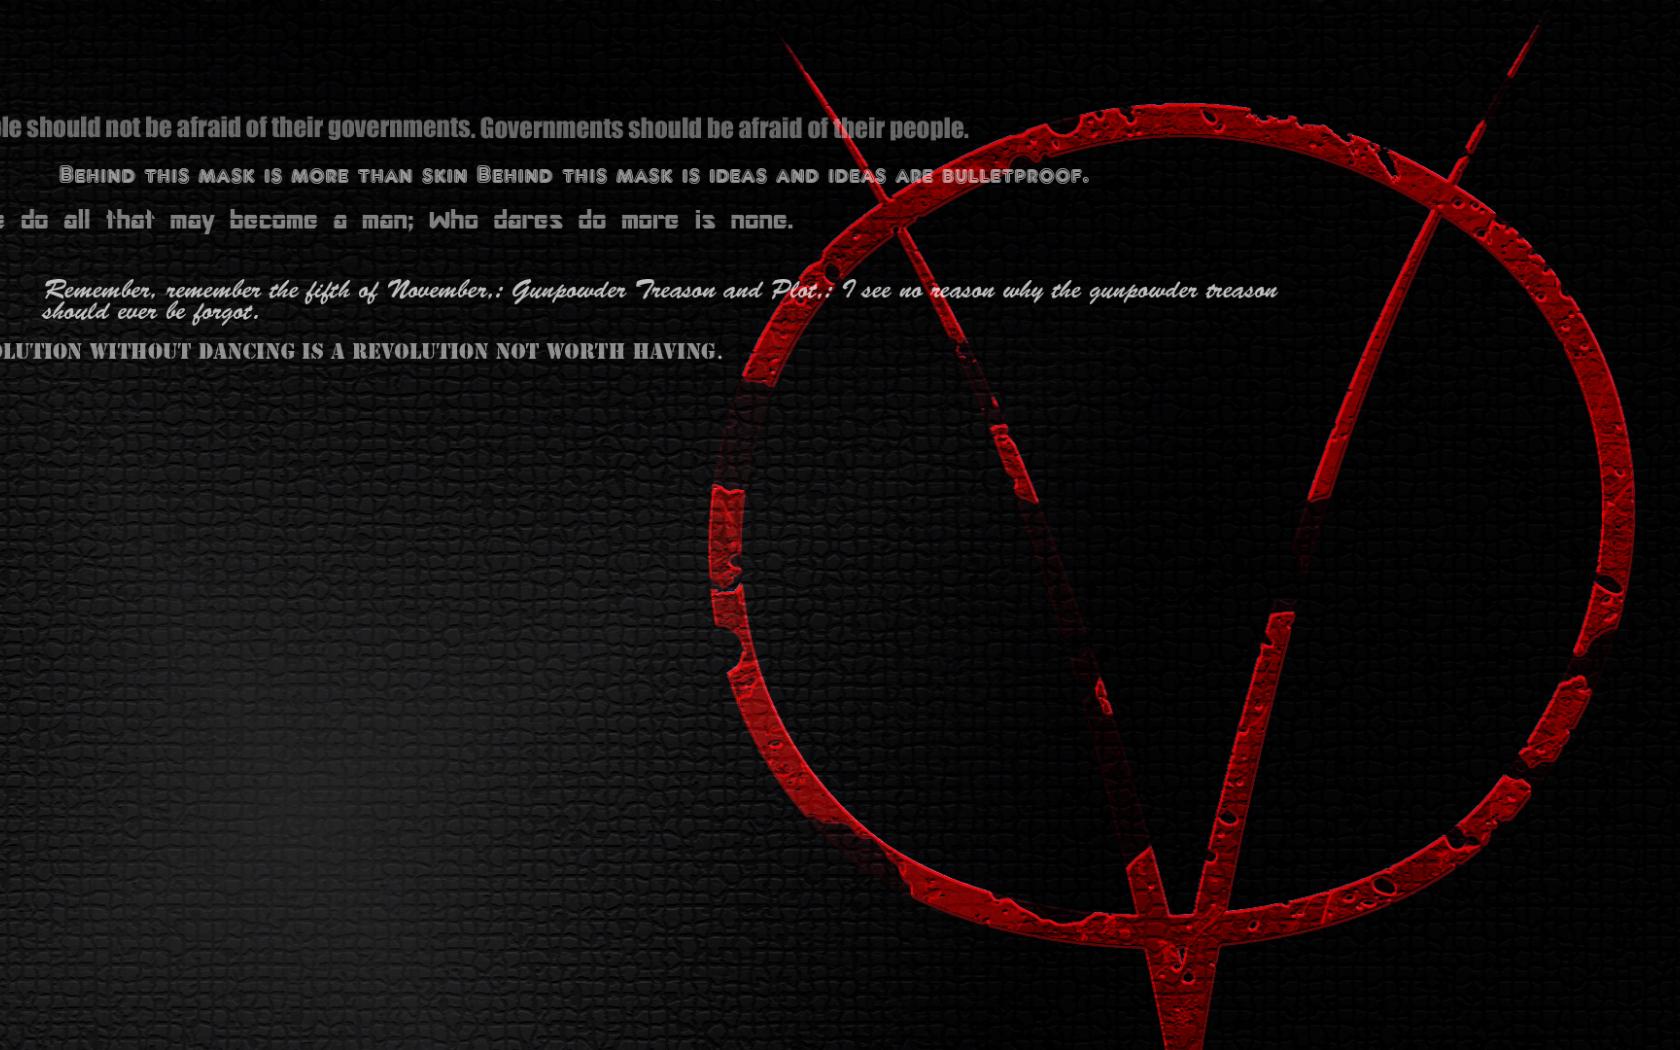 V For Vendetta Wallpapers 1920x1080 Download Resolutions Desktop 1680x1050 1600x900 1536x864 1440x900 1366x768 1280x1024